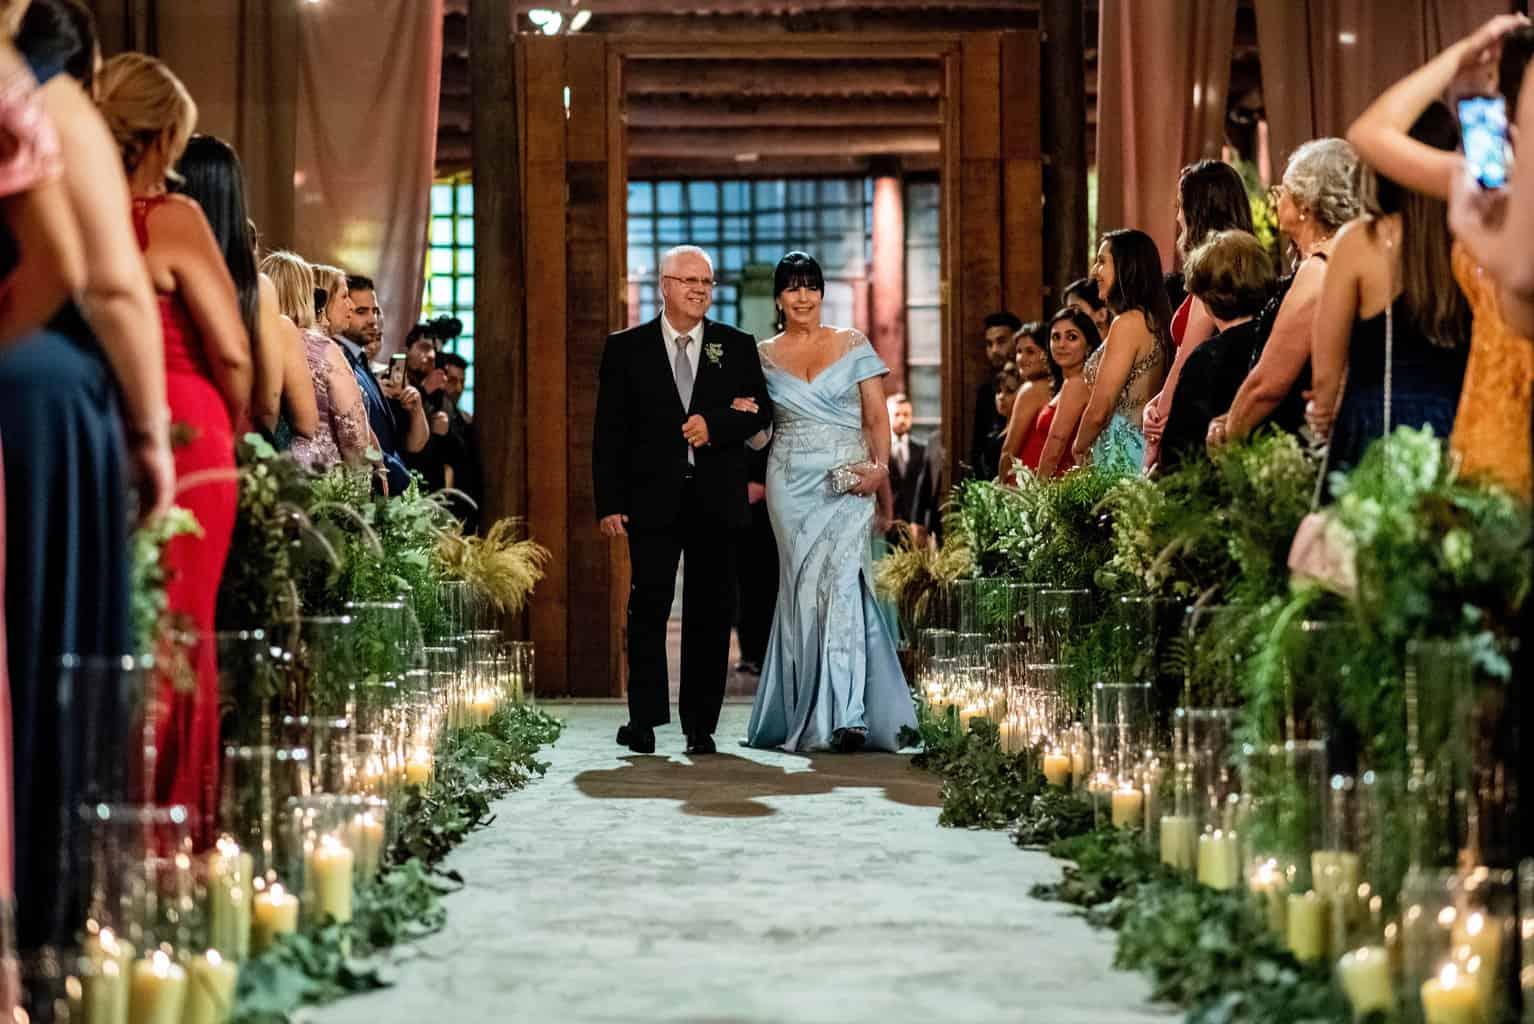 Bel-Benkler-eventos-Casamento-Ariane-e-Matheus-cerimonia-decoracao-contemporanea-fotografia-Rafael-Bigarelli-noivos-na-pista-Spazio-Giardini-37